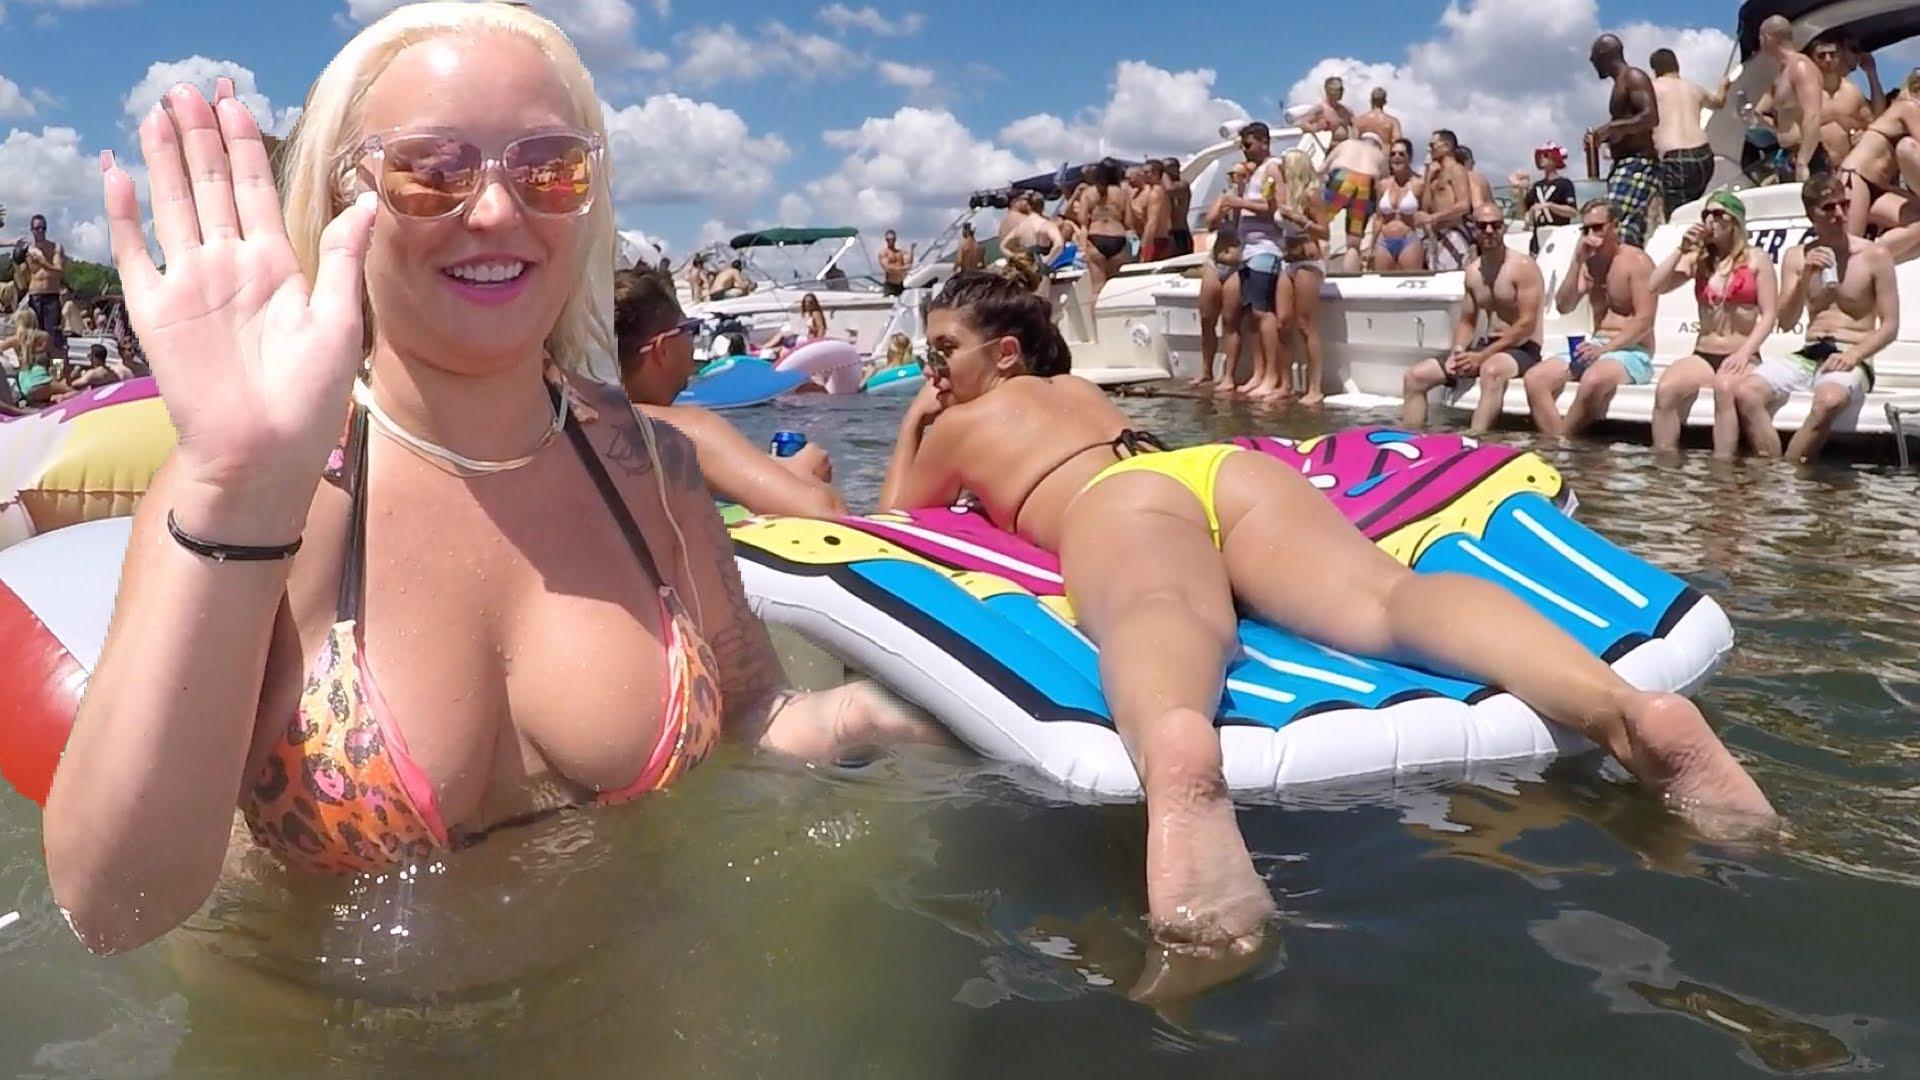 Tabasco reccomend Bikini parties gone wild